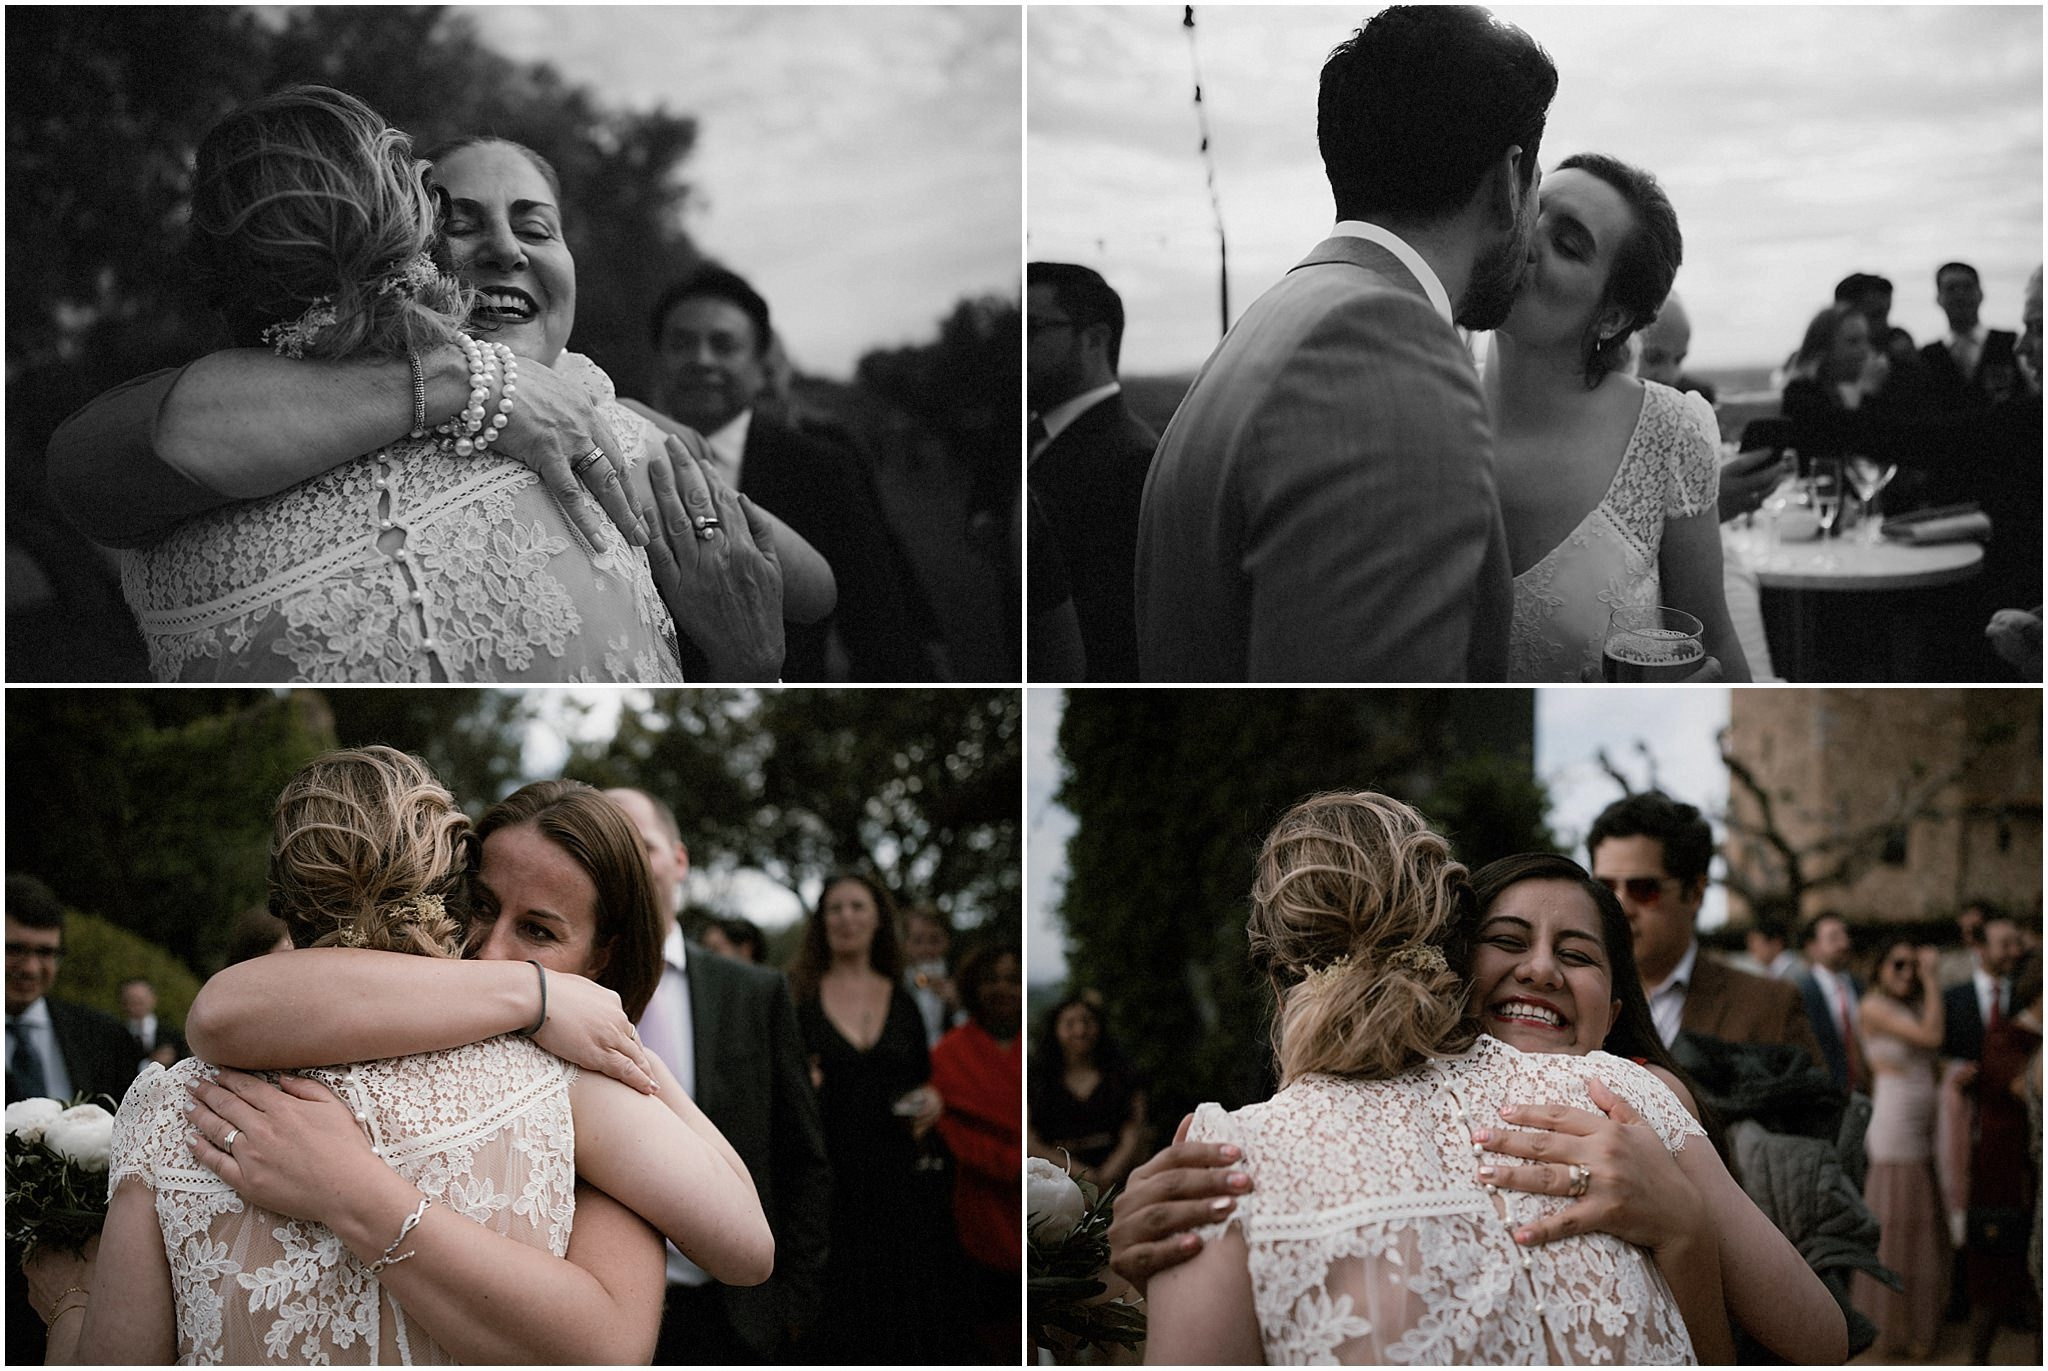 Bruidsfotograaf Spanje Castle d'Emporda destination wedding Naomi van der Kraan00048.jpg